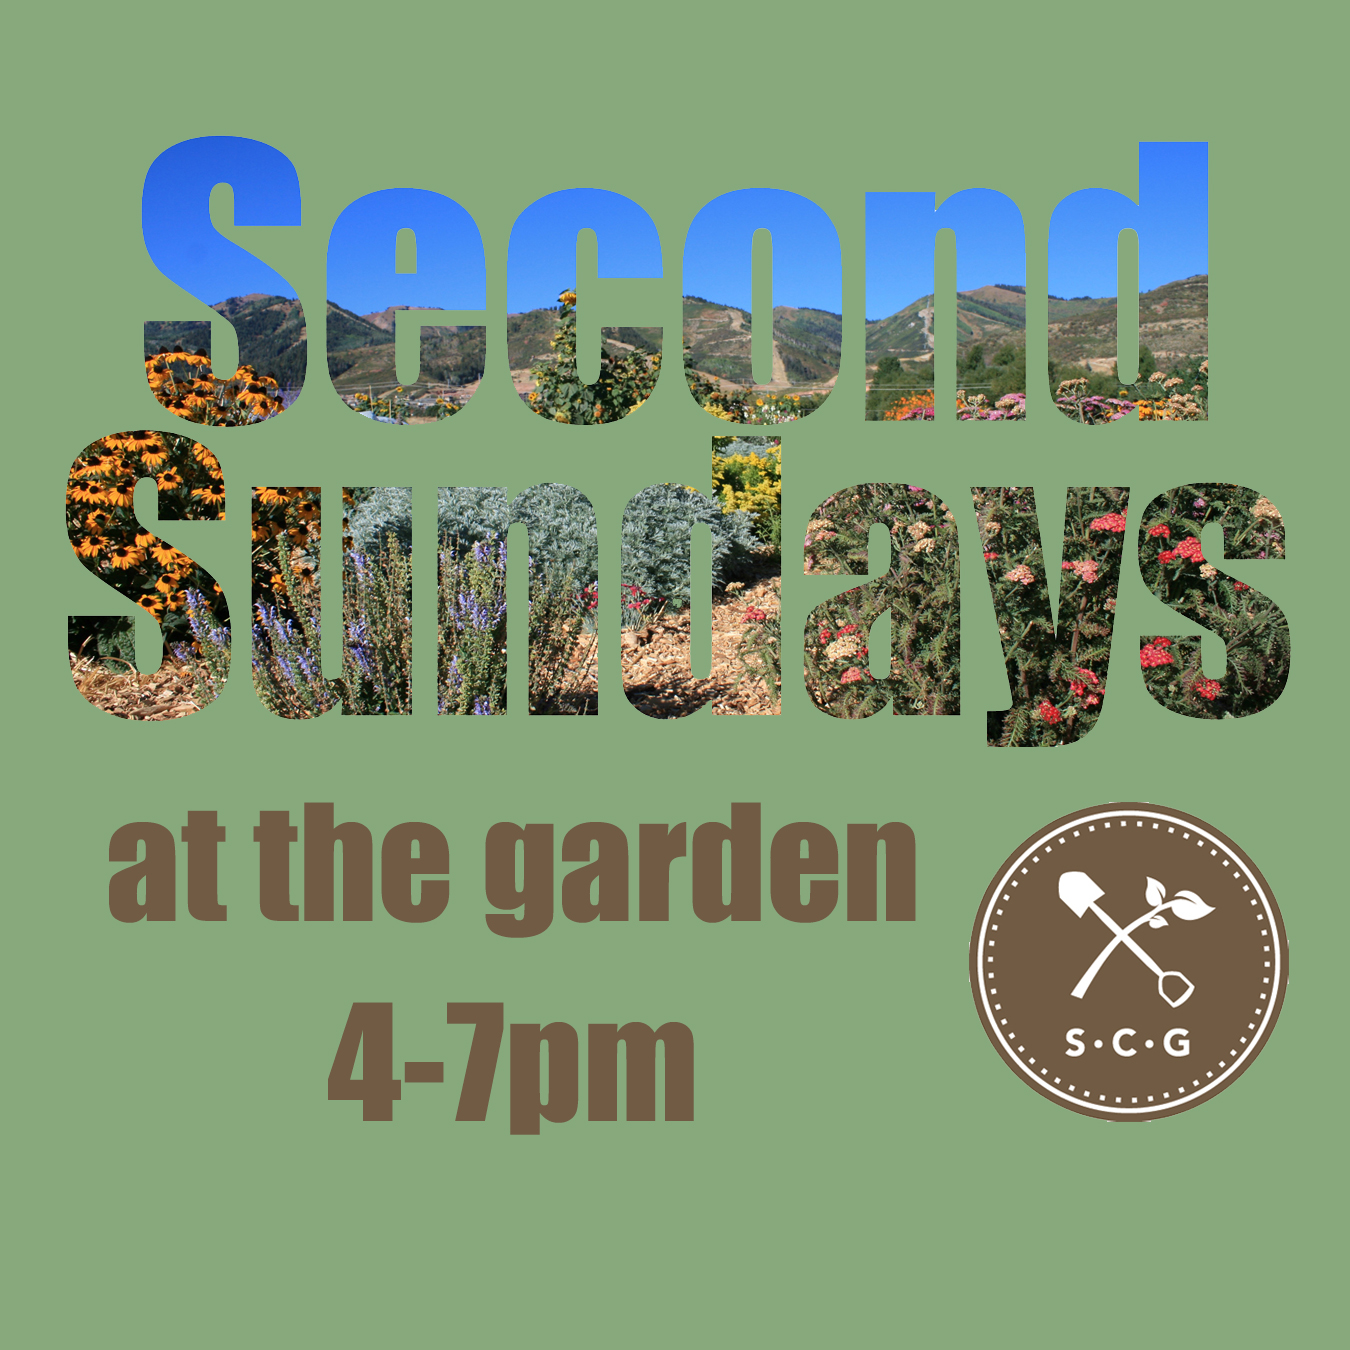 Second Sundays Square.jpg